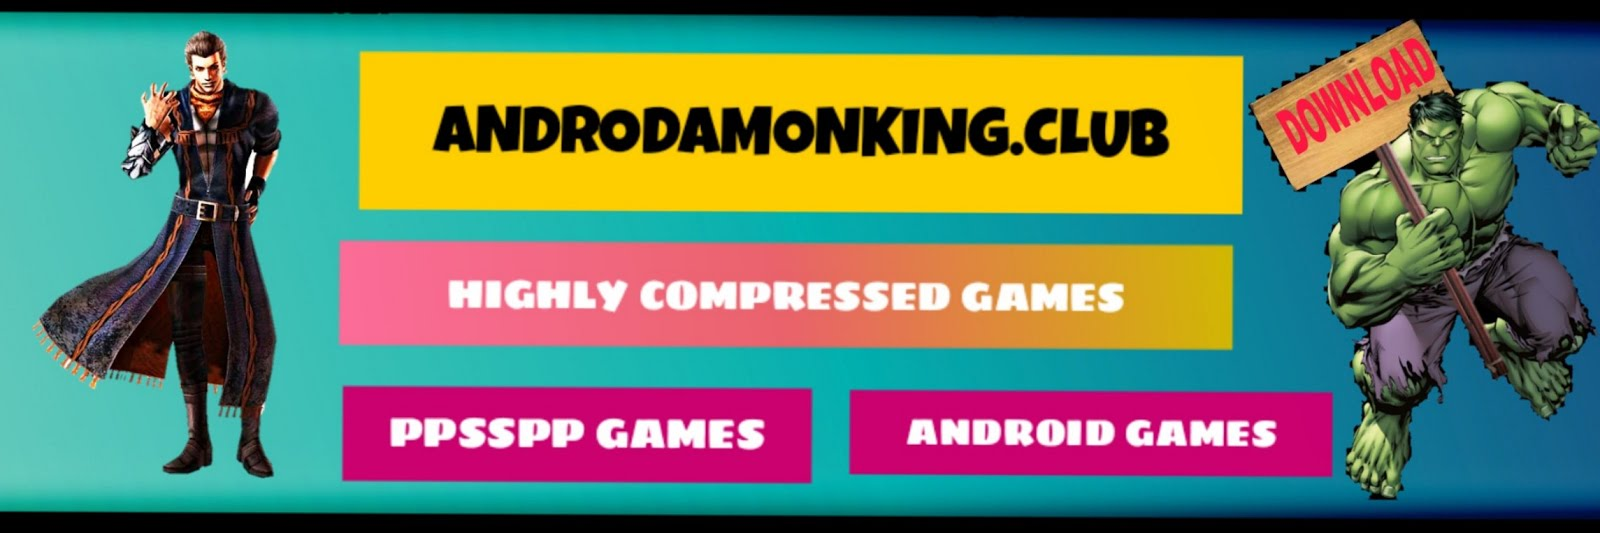 download damon ps2 emulator cracked